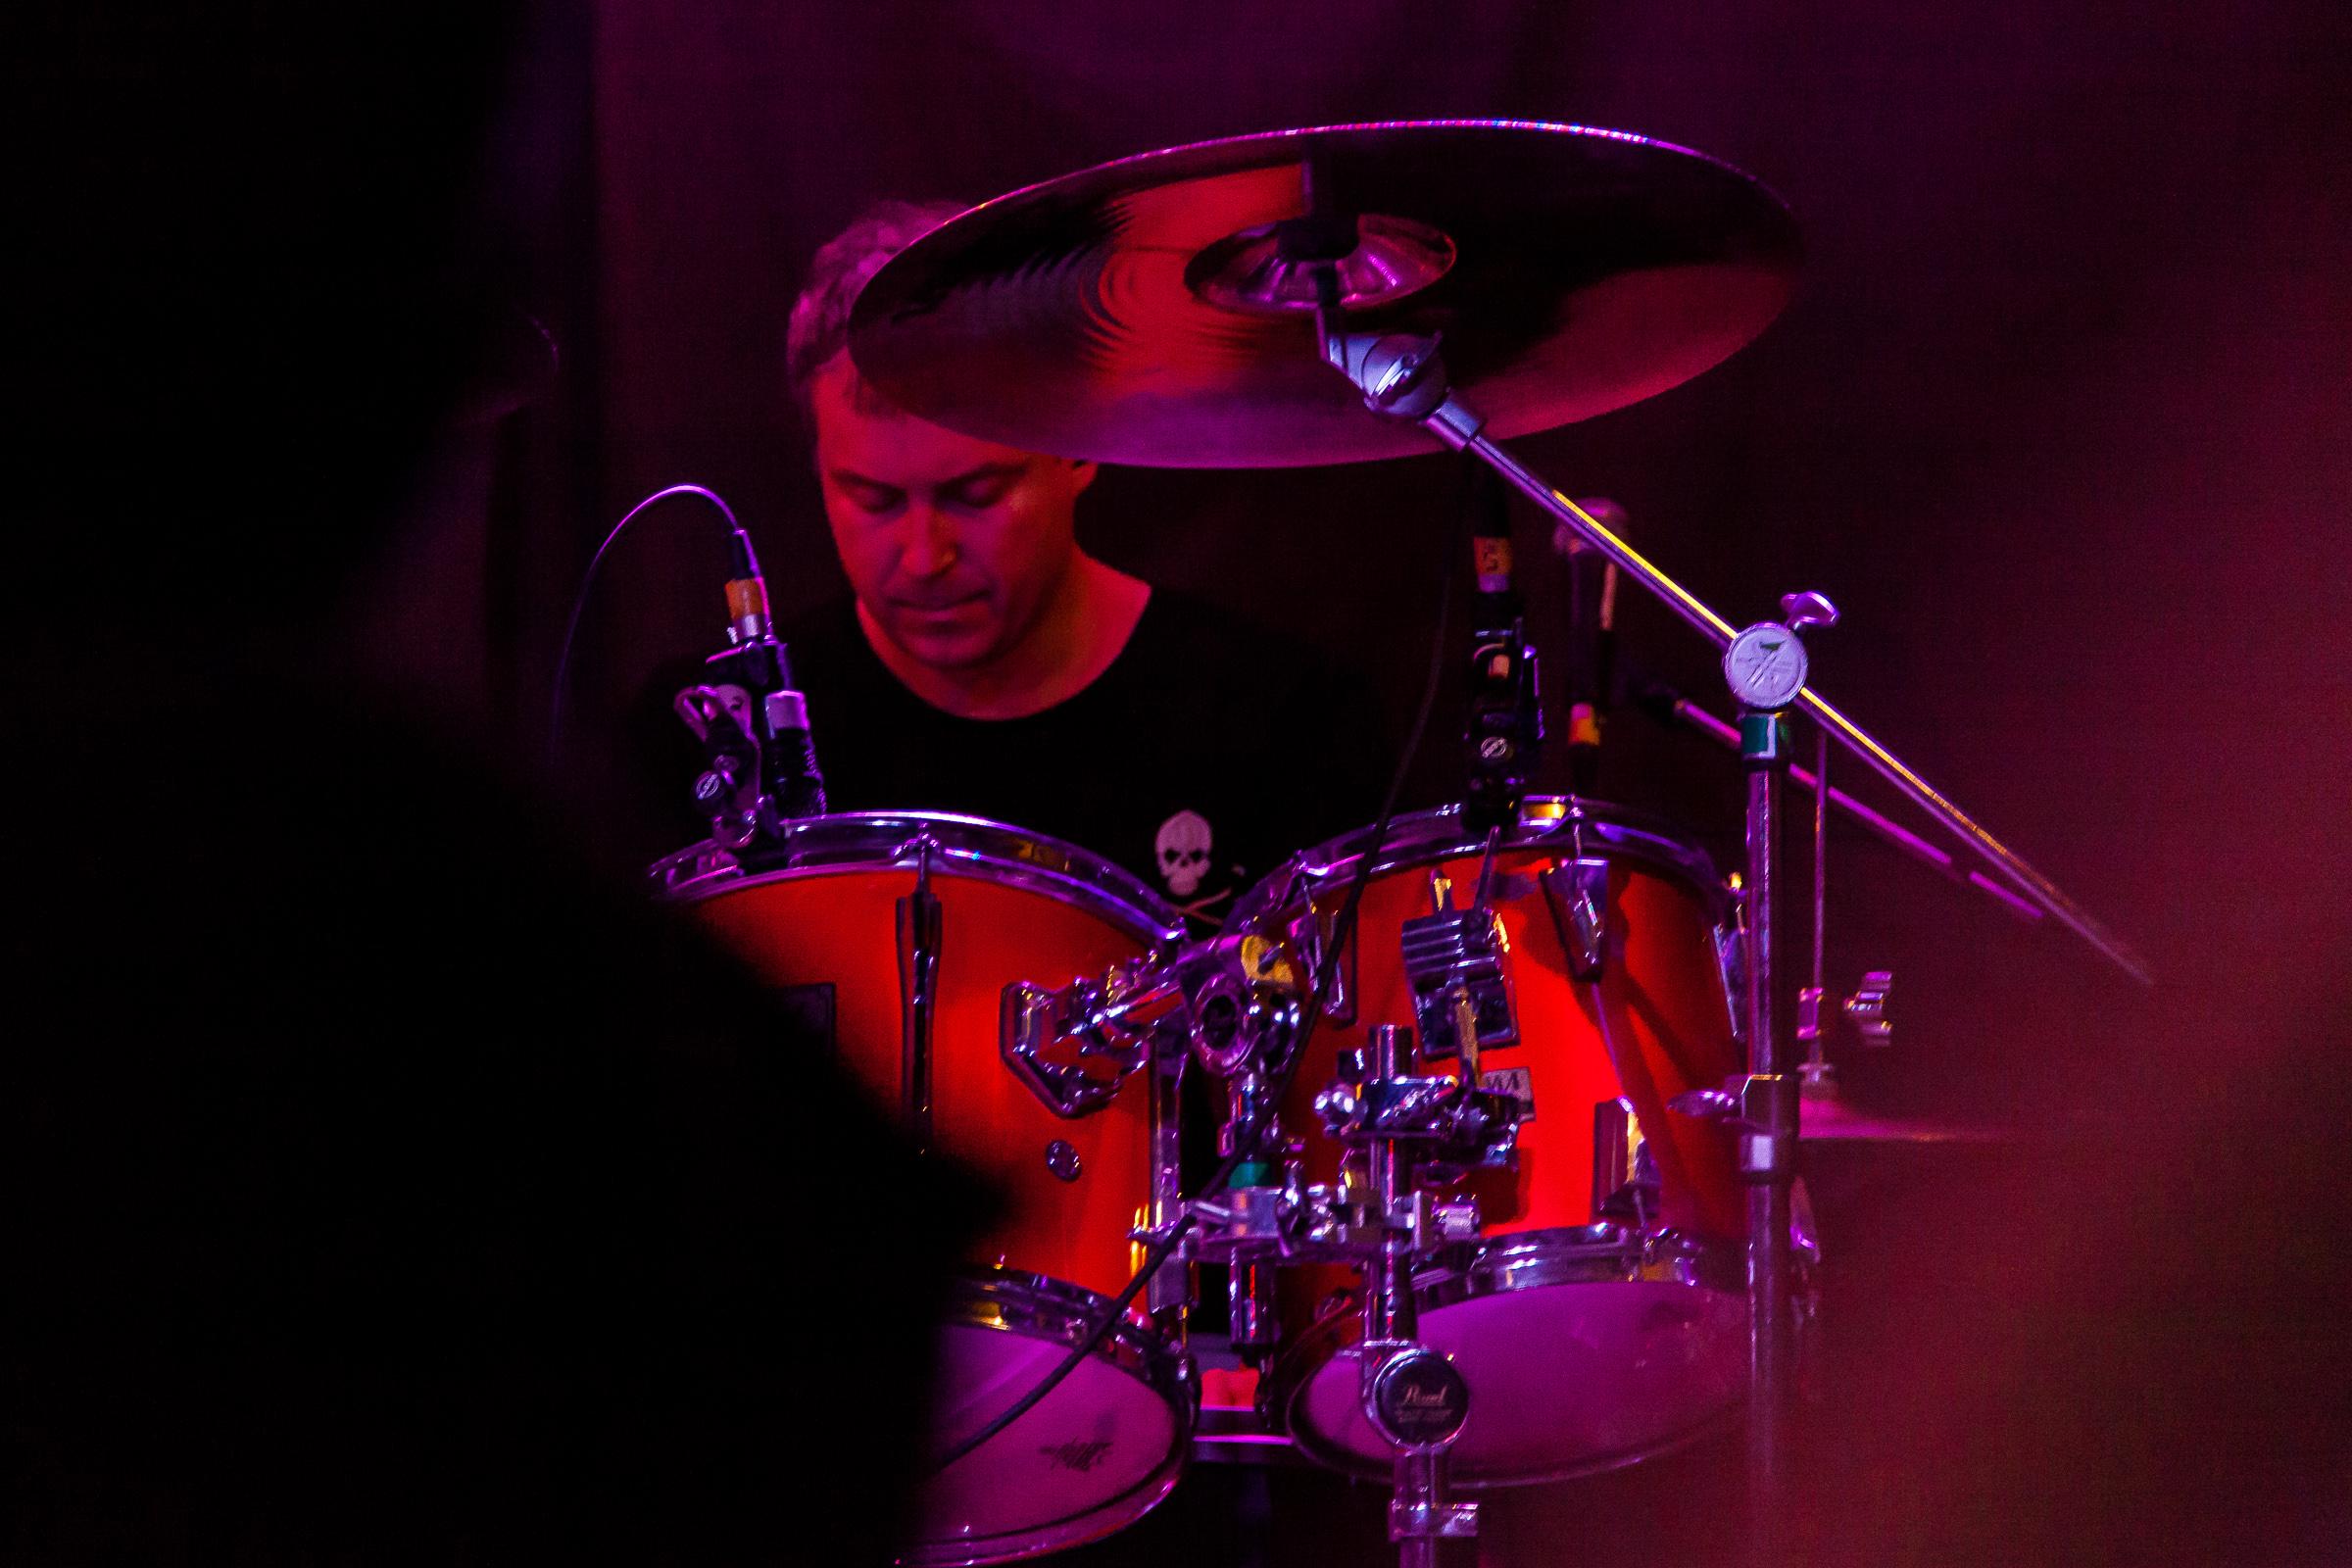 Jord Samolesky